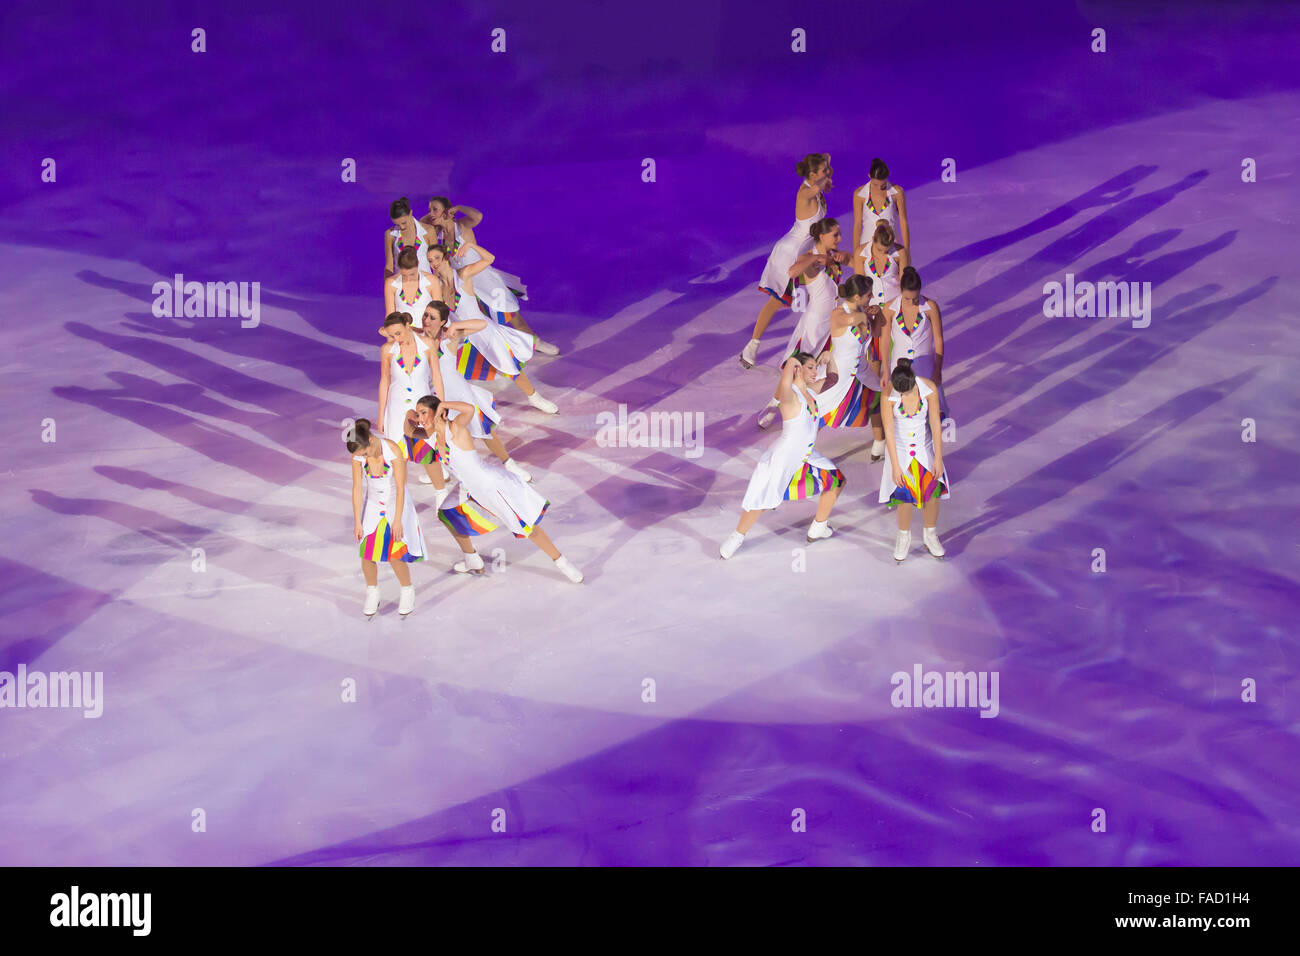 Hot Shivers, Italian Synchronized  Skating Team - Stock Image